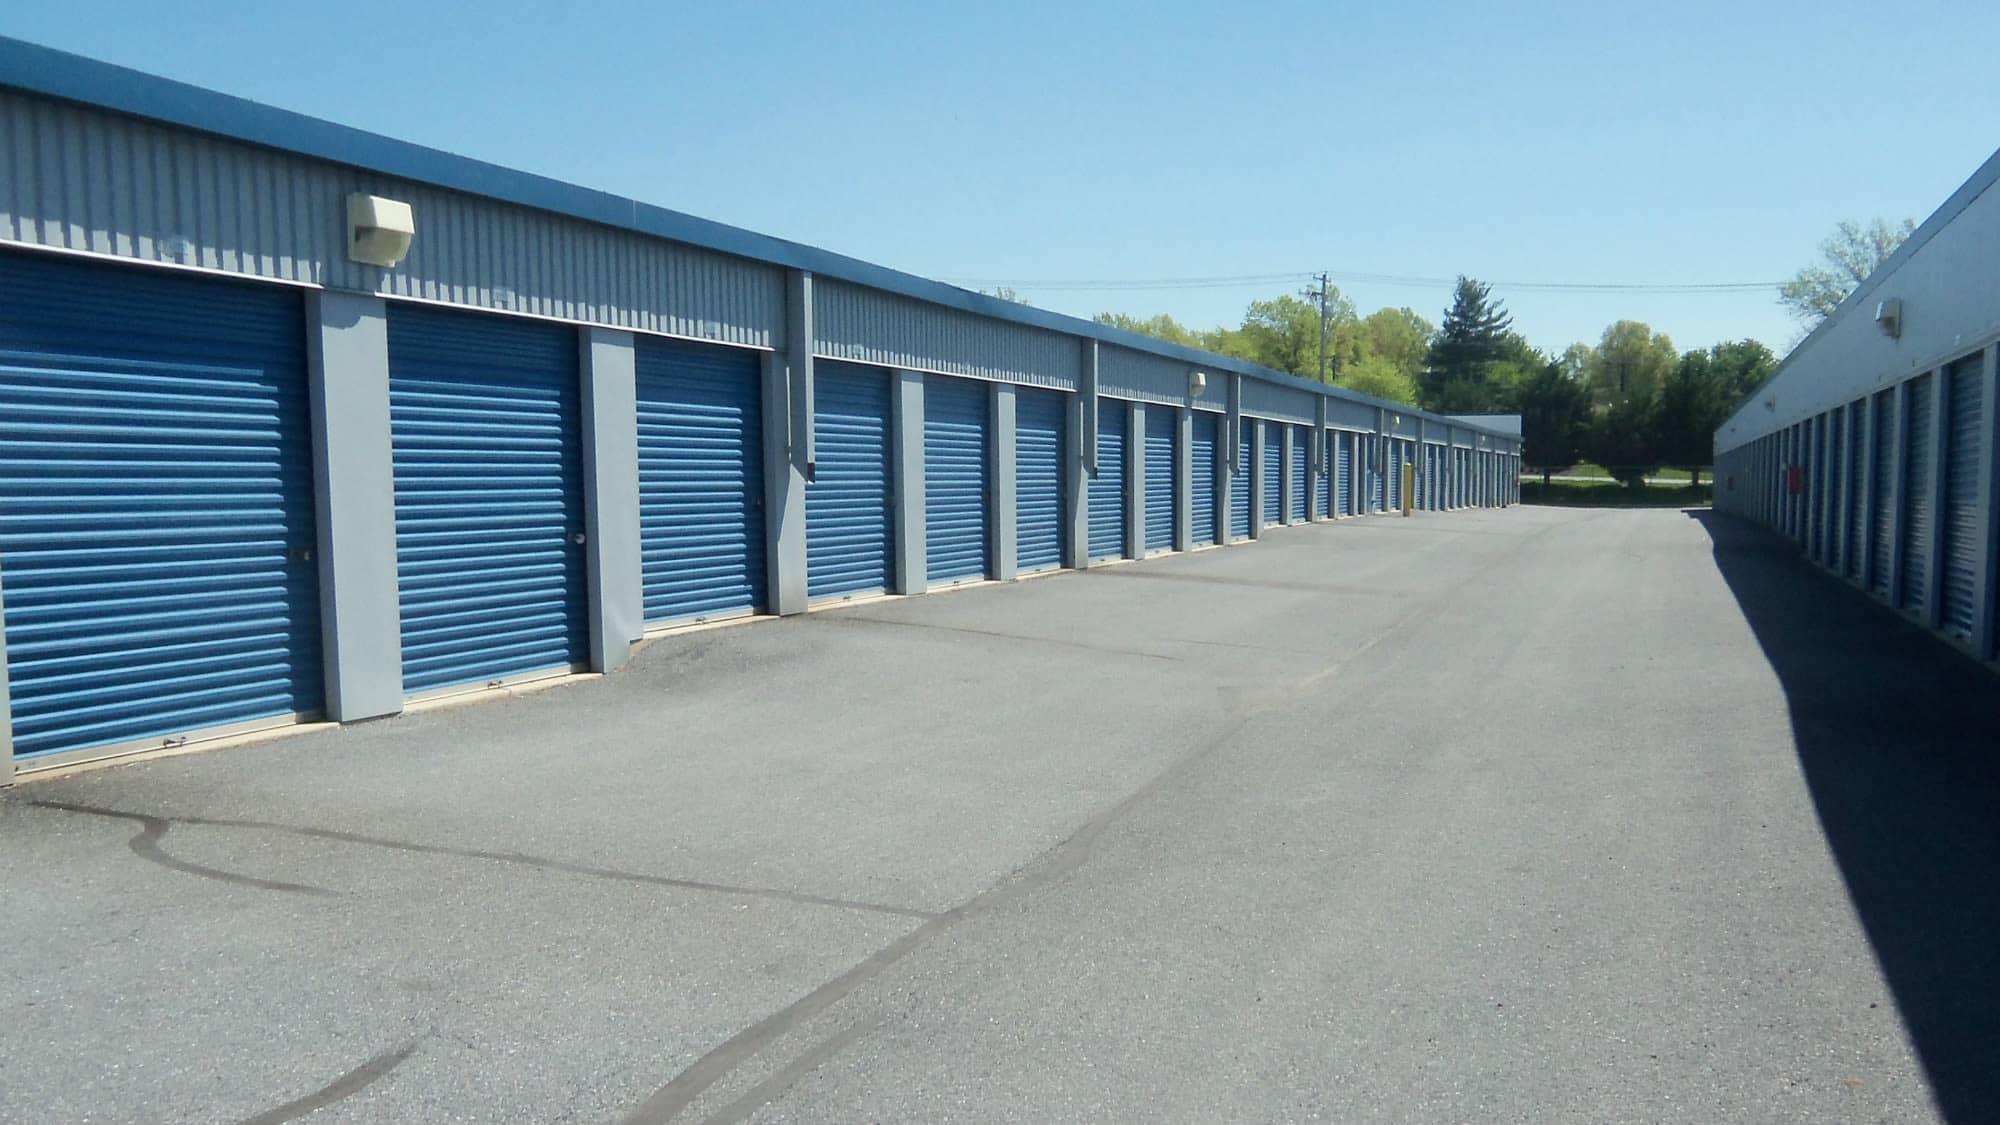 Wide driveways at Self Storage Plus in Walkersville, MD